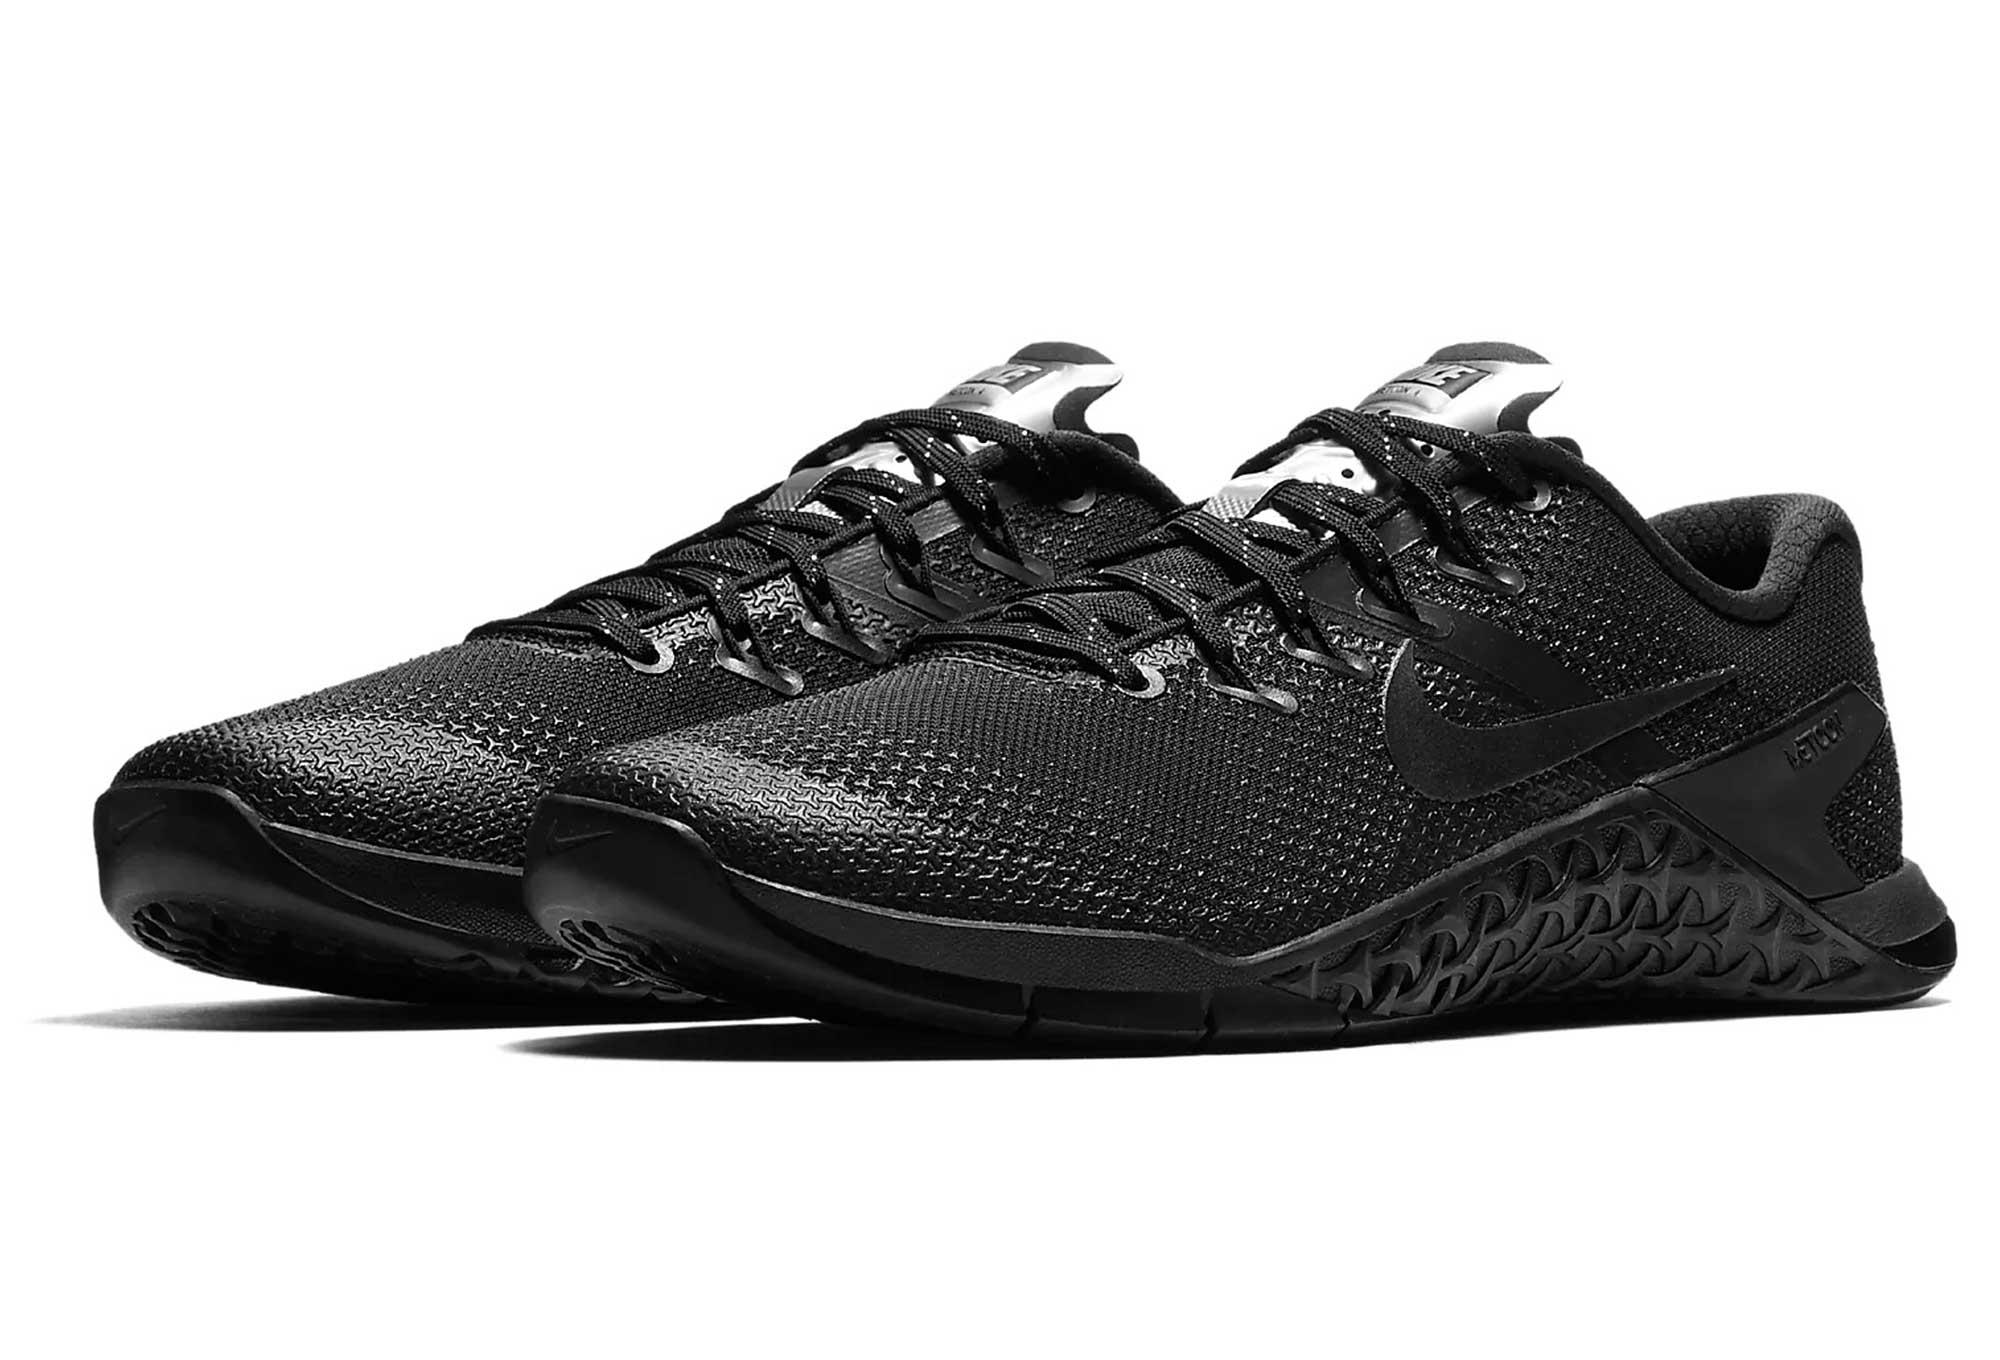 chaussures de cross training femme nike metcon 4 selfie argent noir. Black Bedroom Furniture Sets. Home Design Ideas